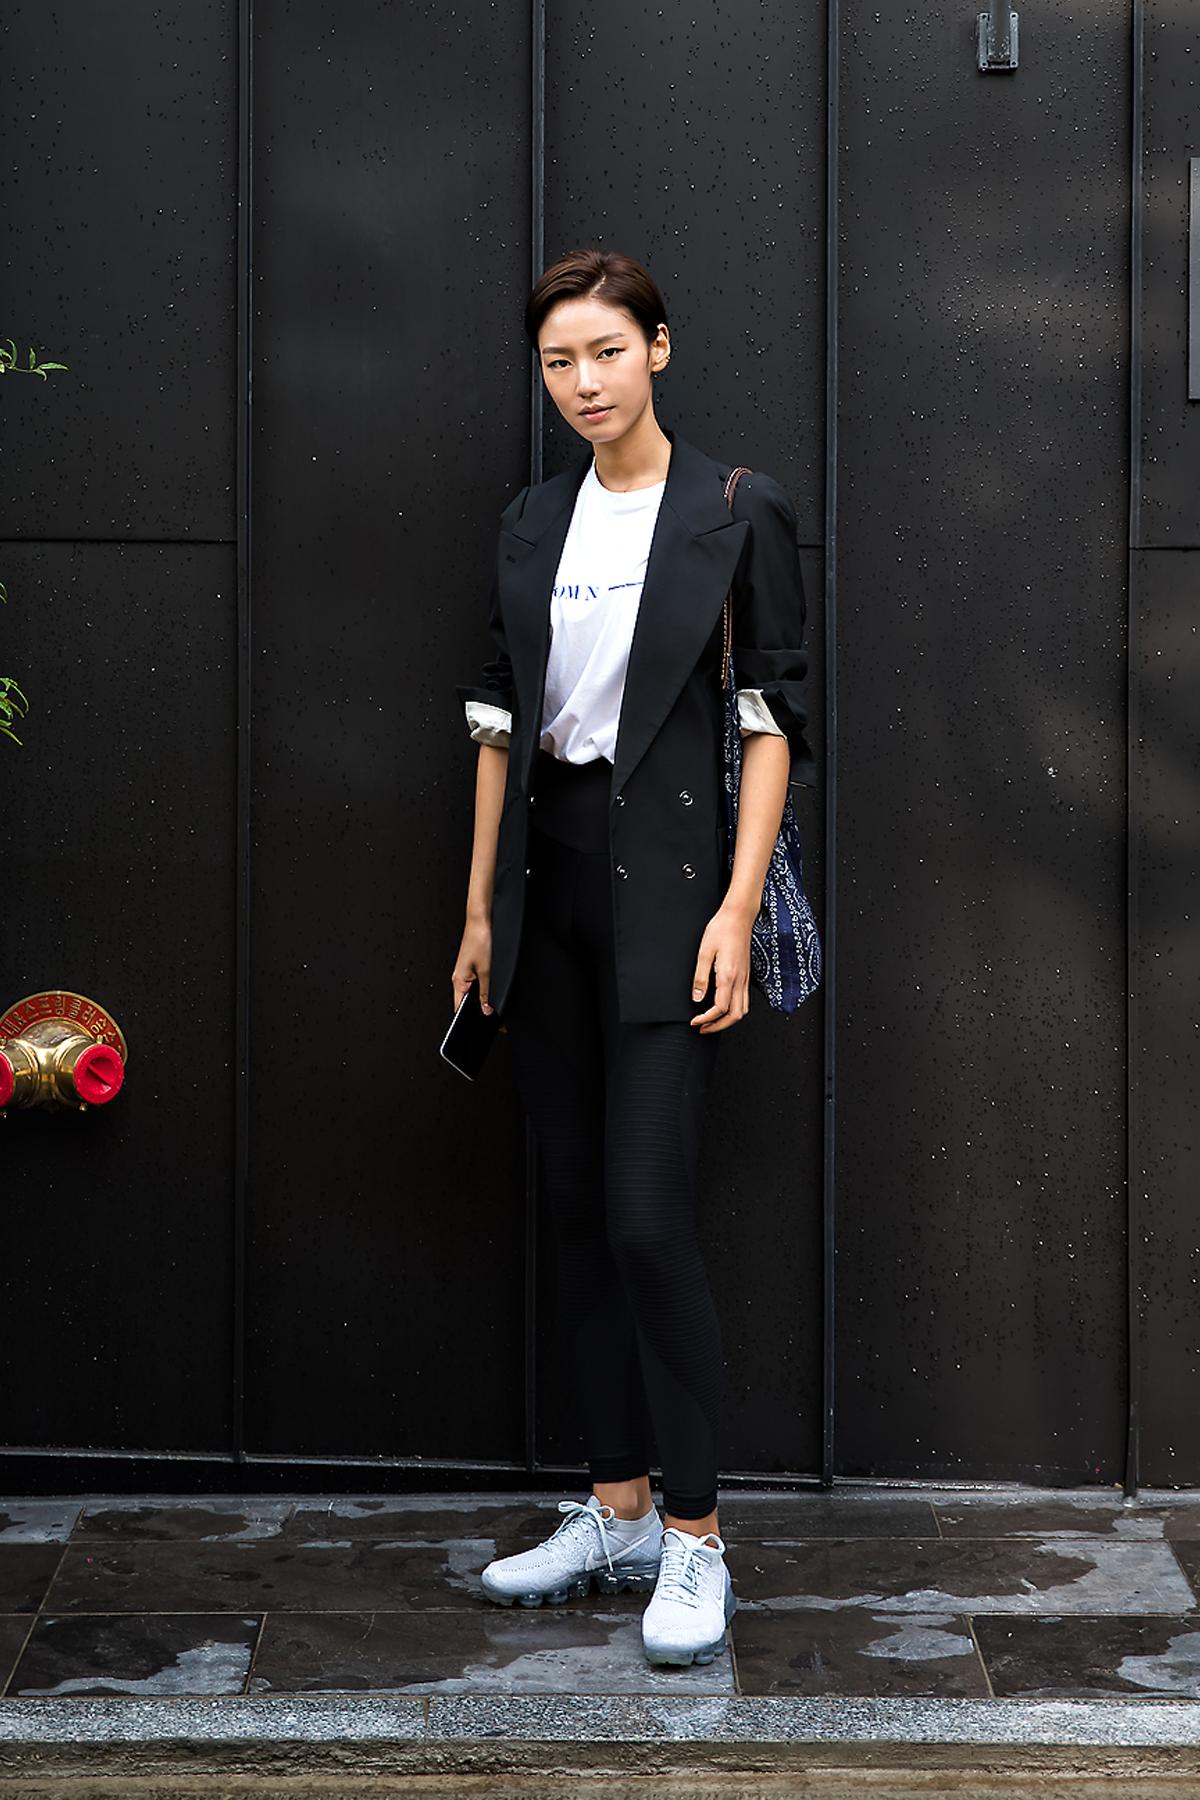 Park Seul-gi, Street Fashion 2017 in Seoul.jpg